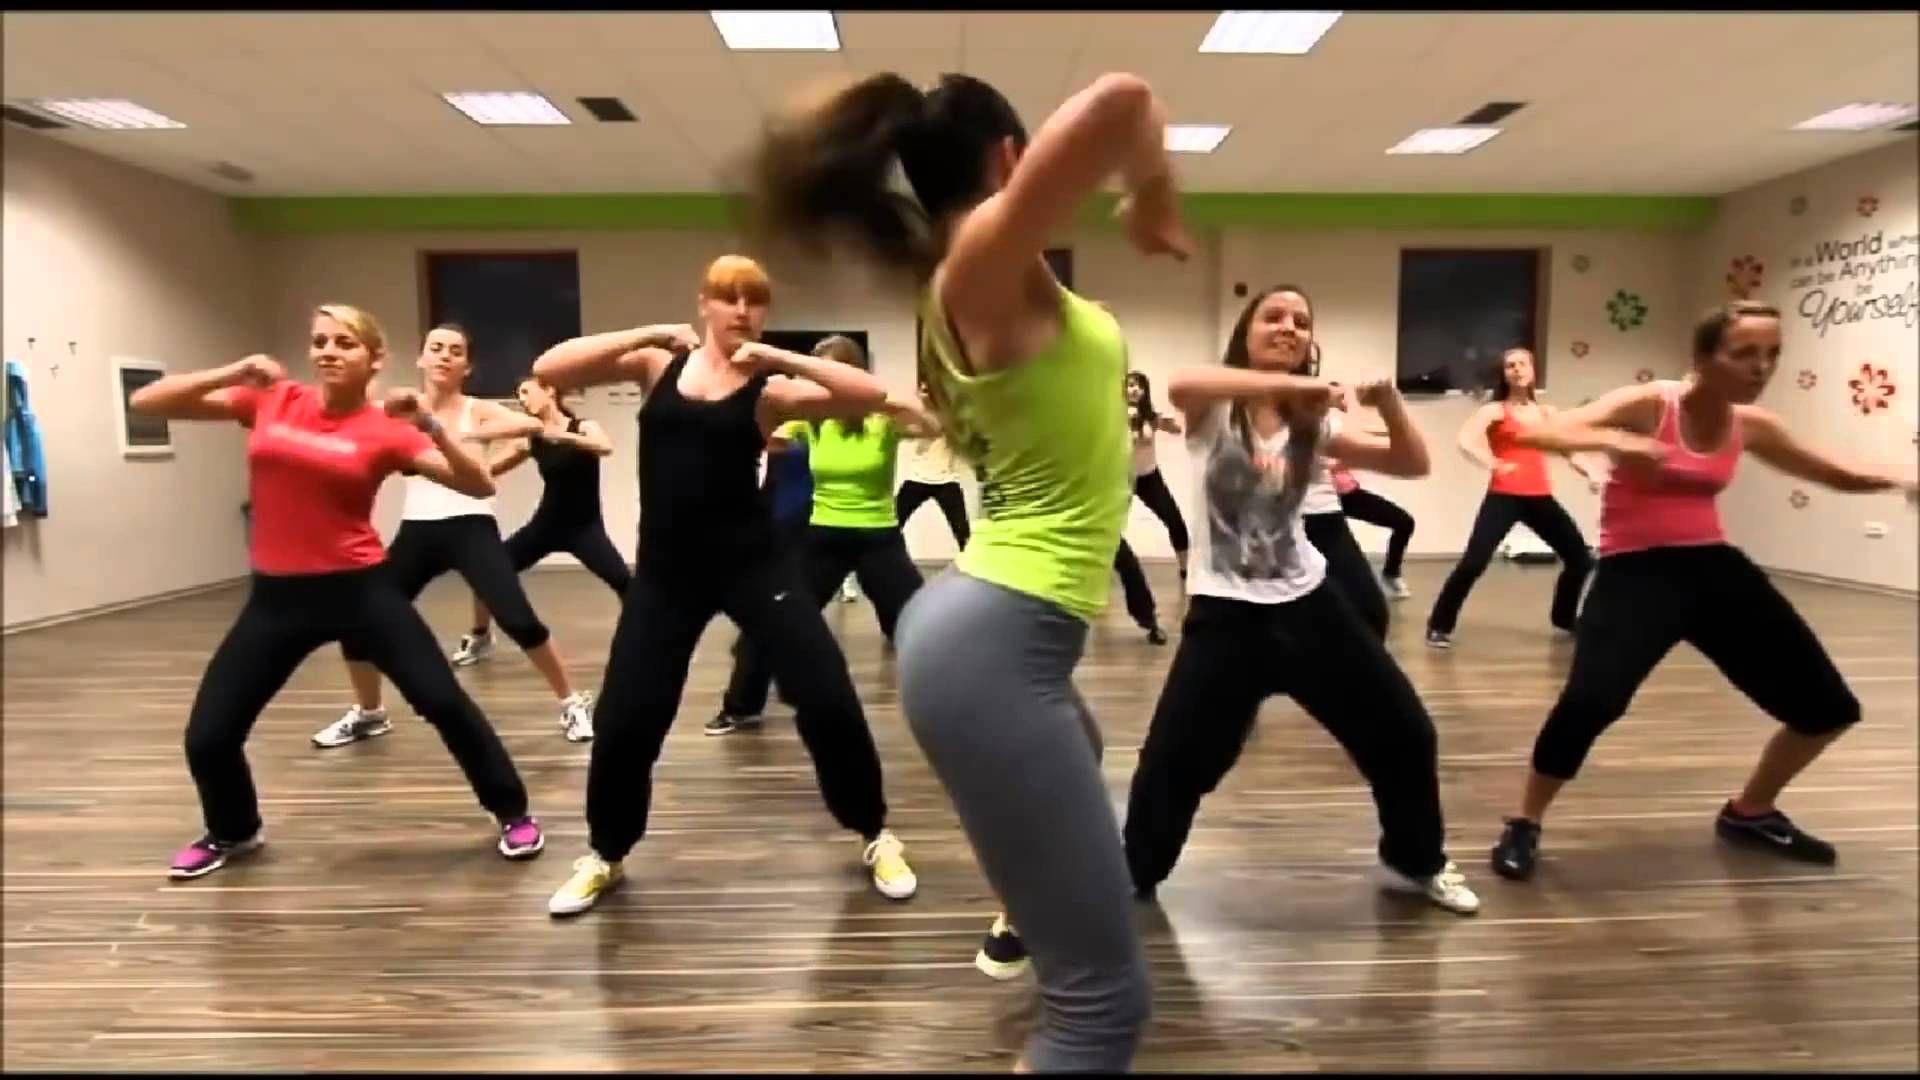 Easy zumba class low impact cardio workout cardio